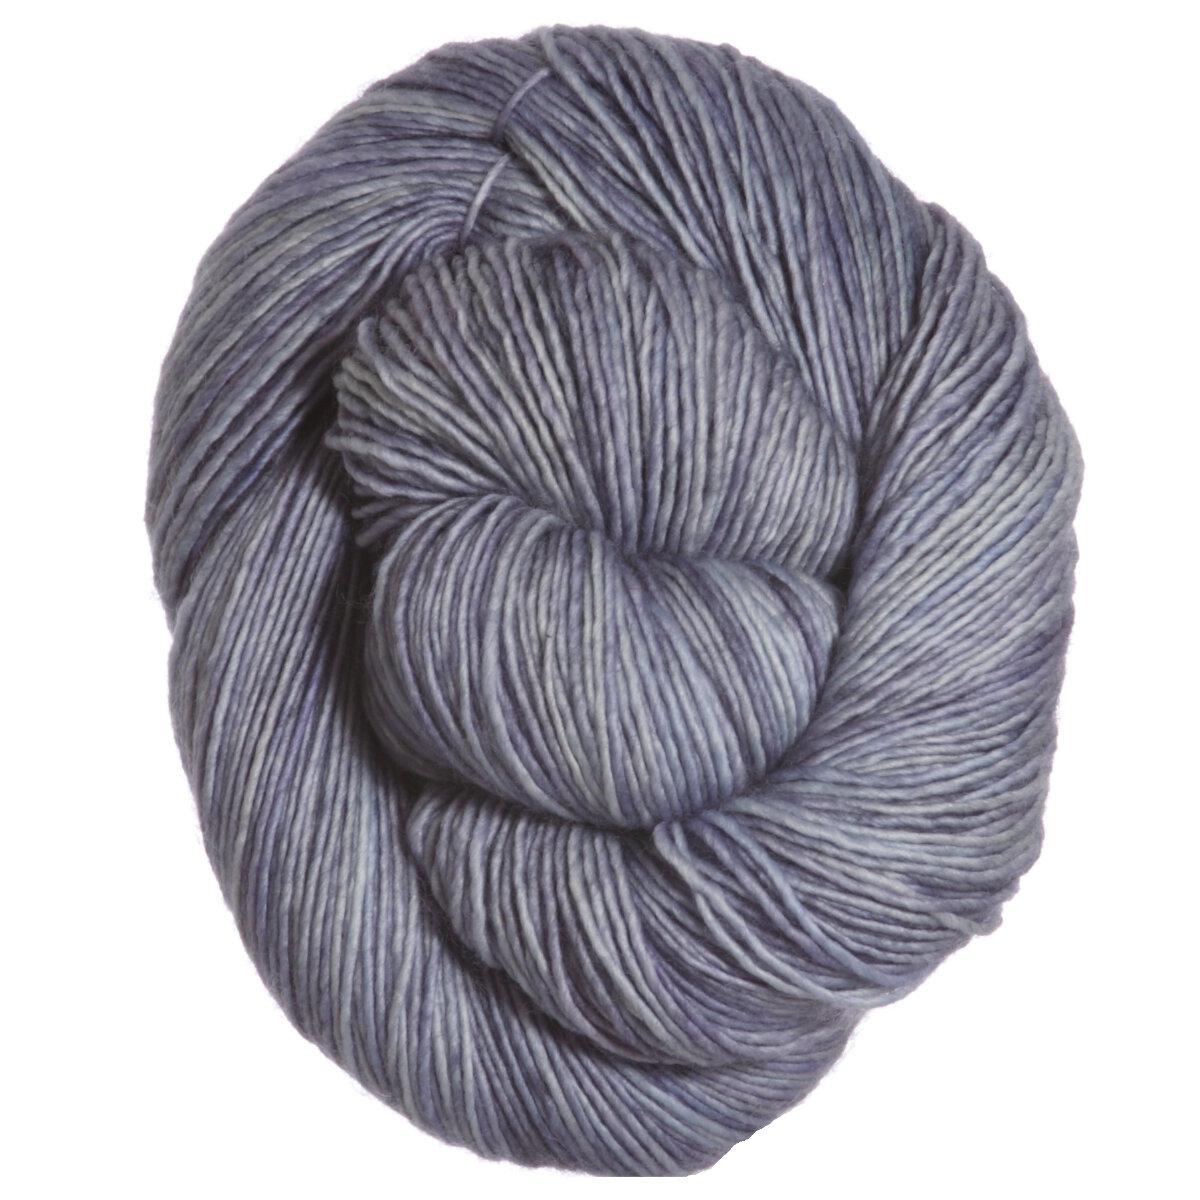 madelinetosh tosh merino light yarn moonstone detailed. Black Bedroom Furniture Sets. Home Design Ideas